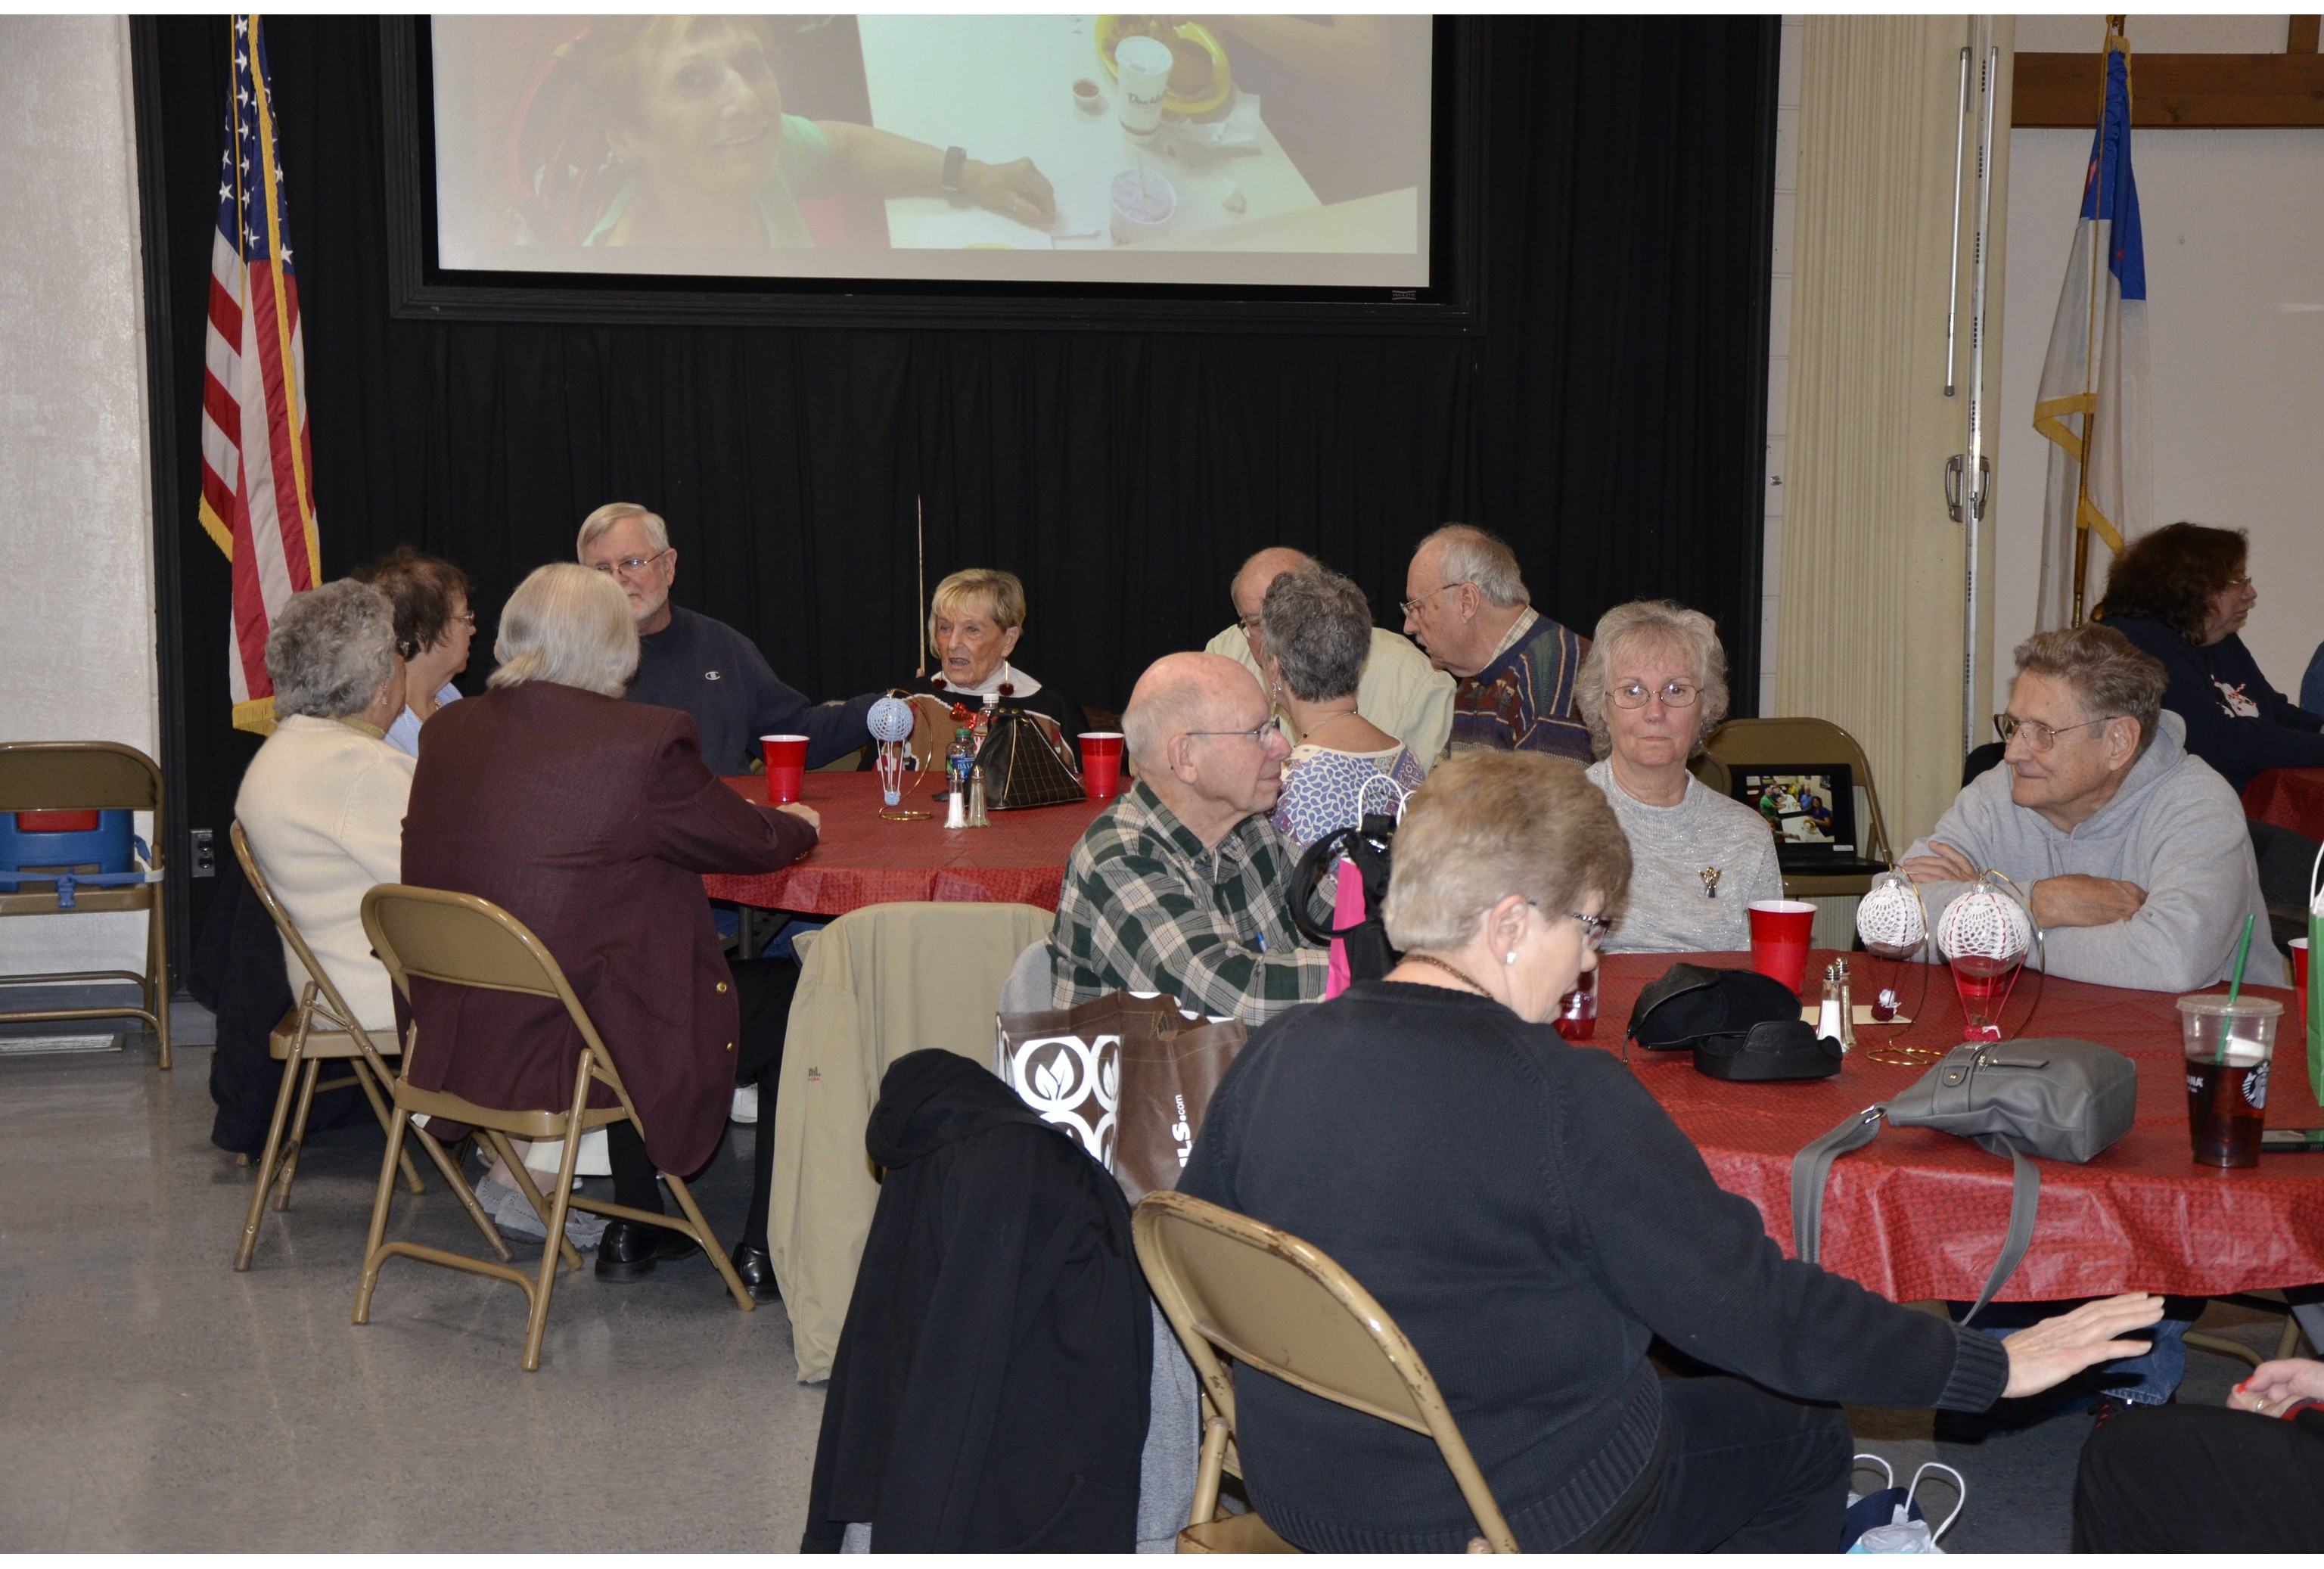 FWRC 2018 Christmas banquet